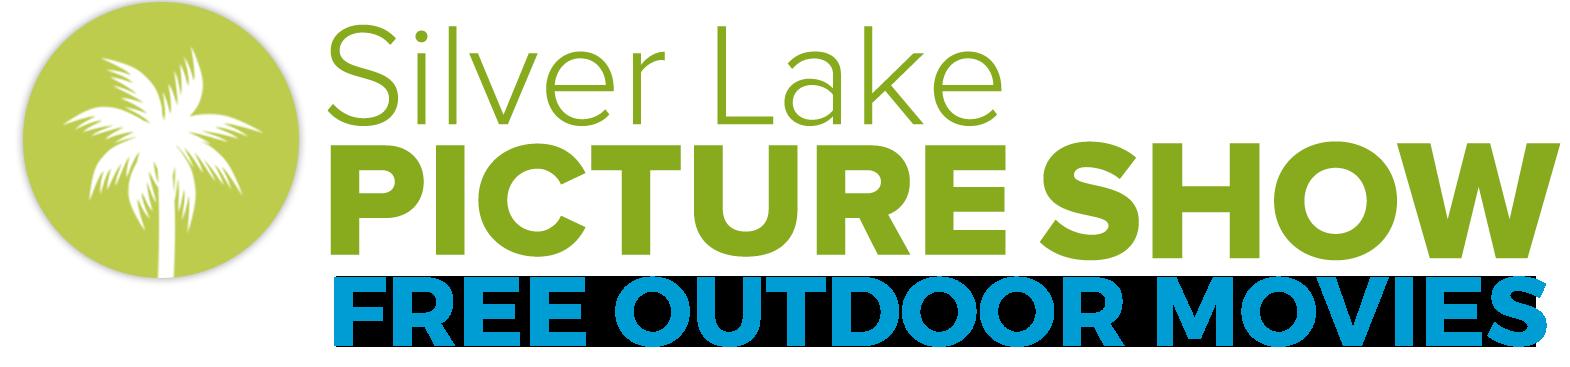 Silver Lake Picture Show